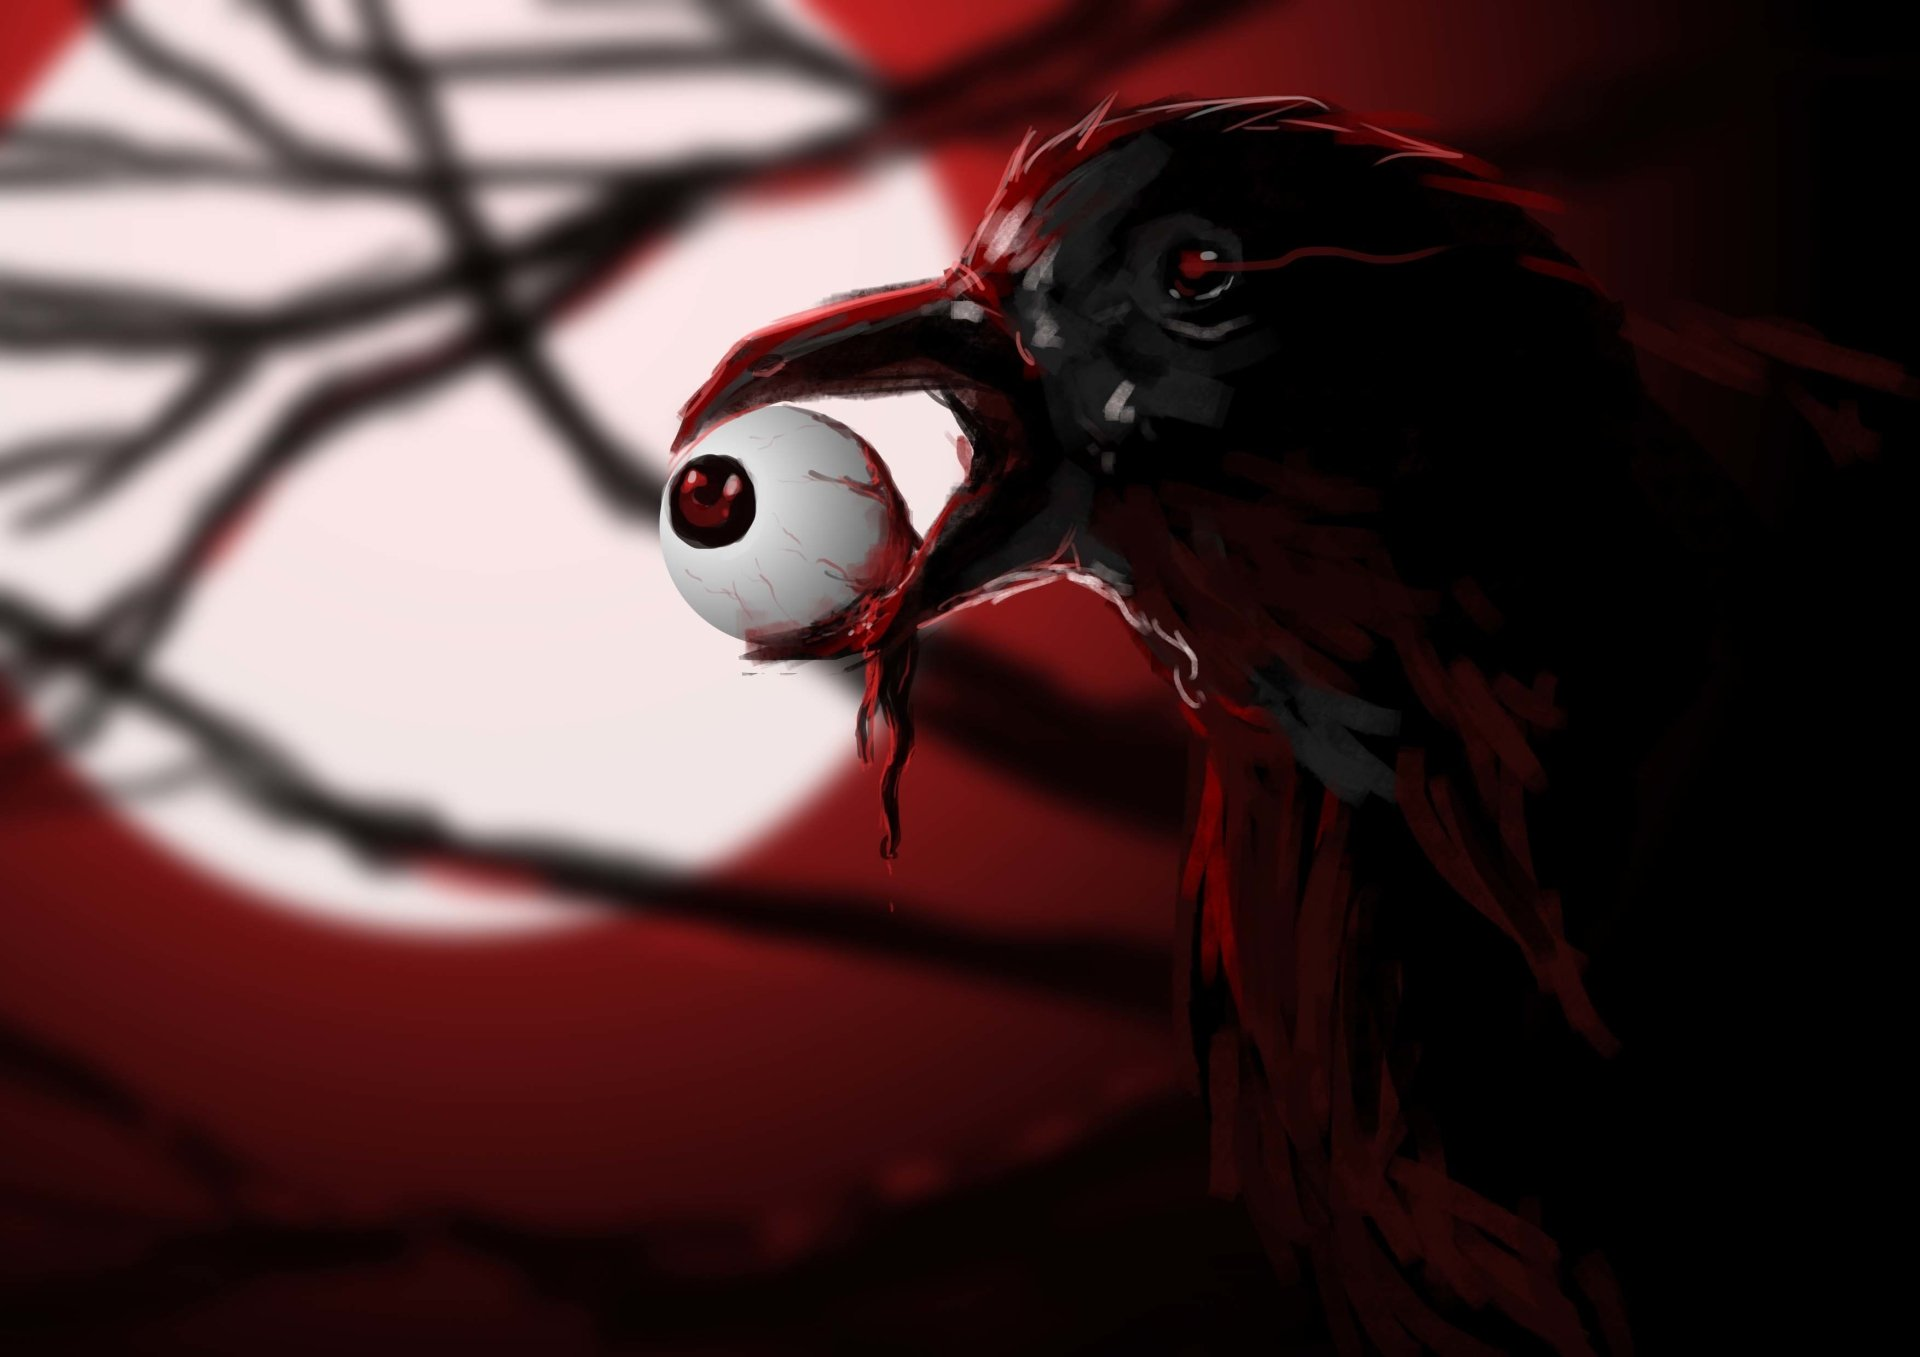 Raven with eyeball hd wallpaper background image - Dark horror creepy wallpapers ...